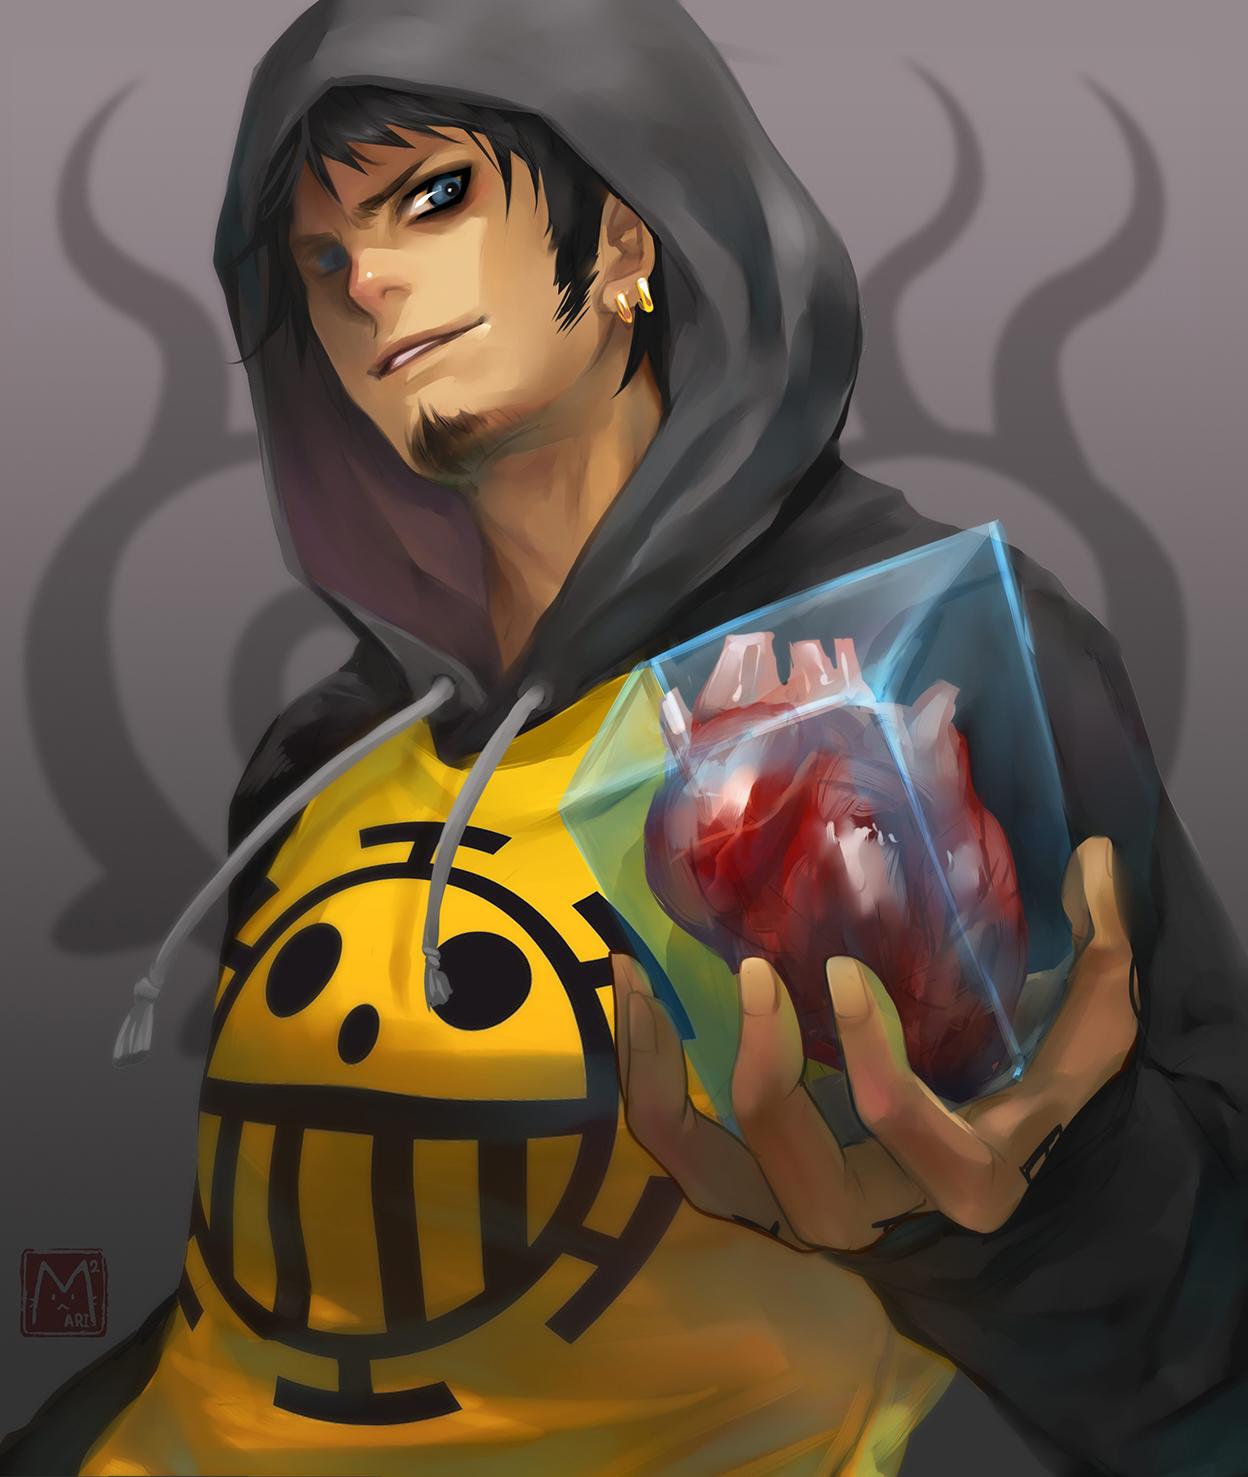 Stealer Of Hearts Trafalgar Law Daily Anime Art